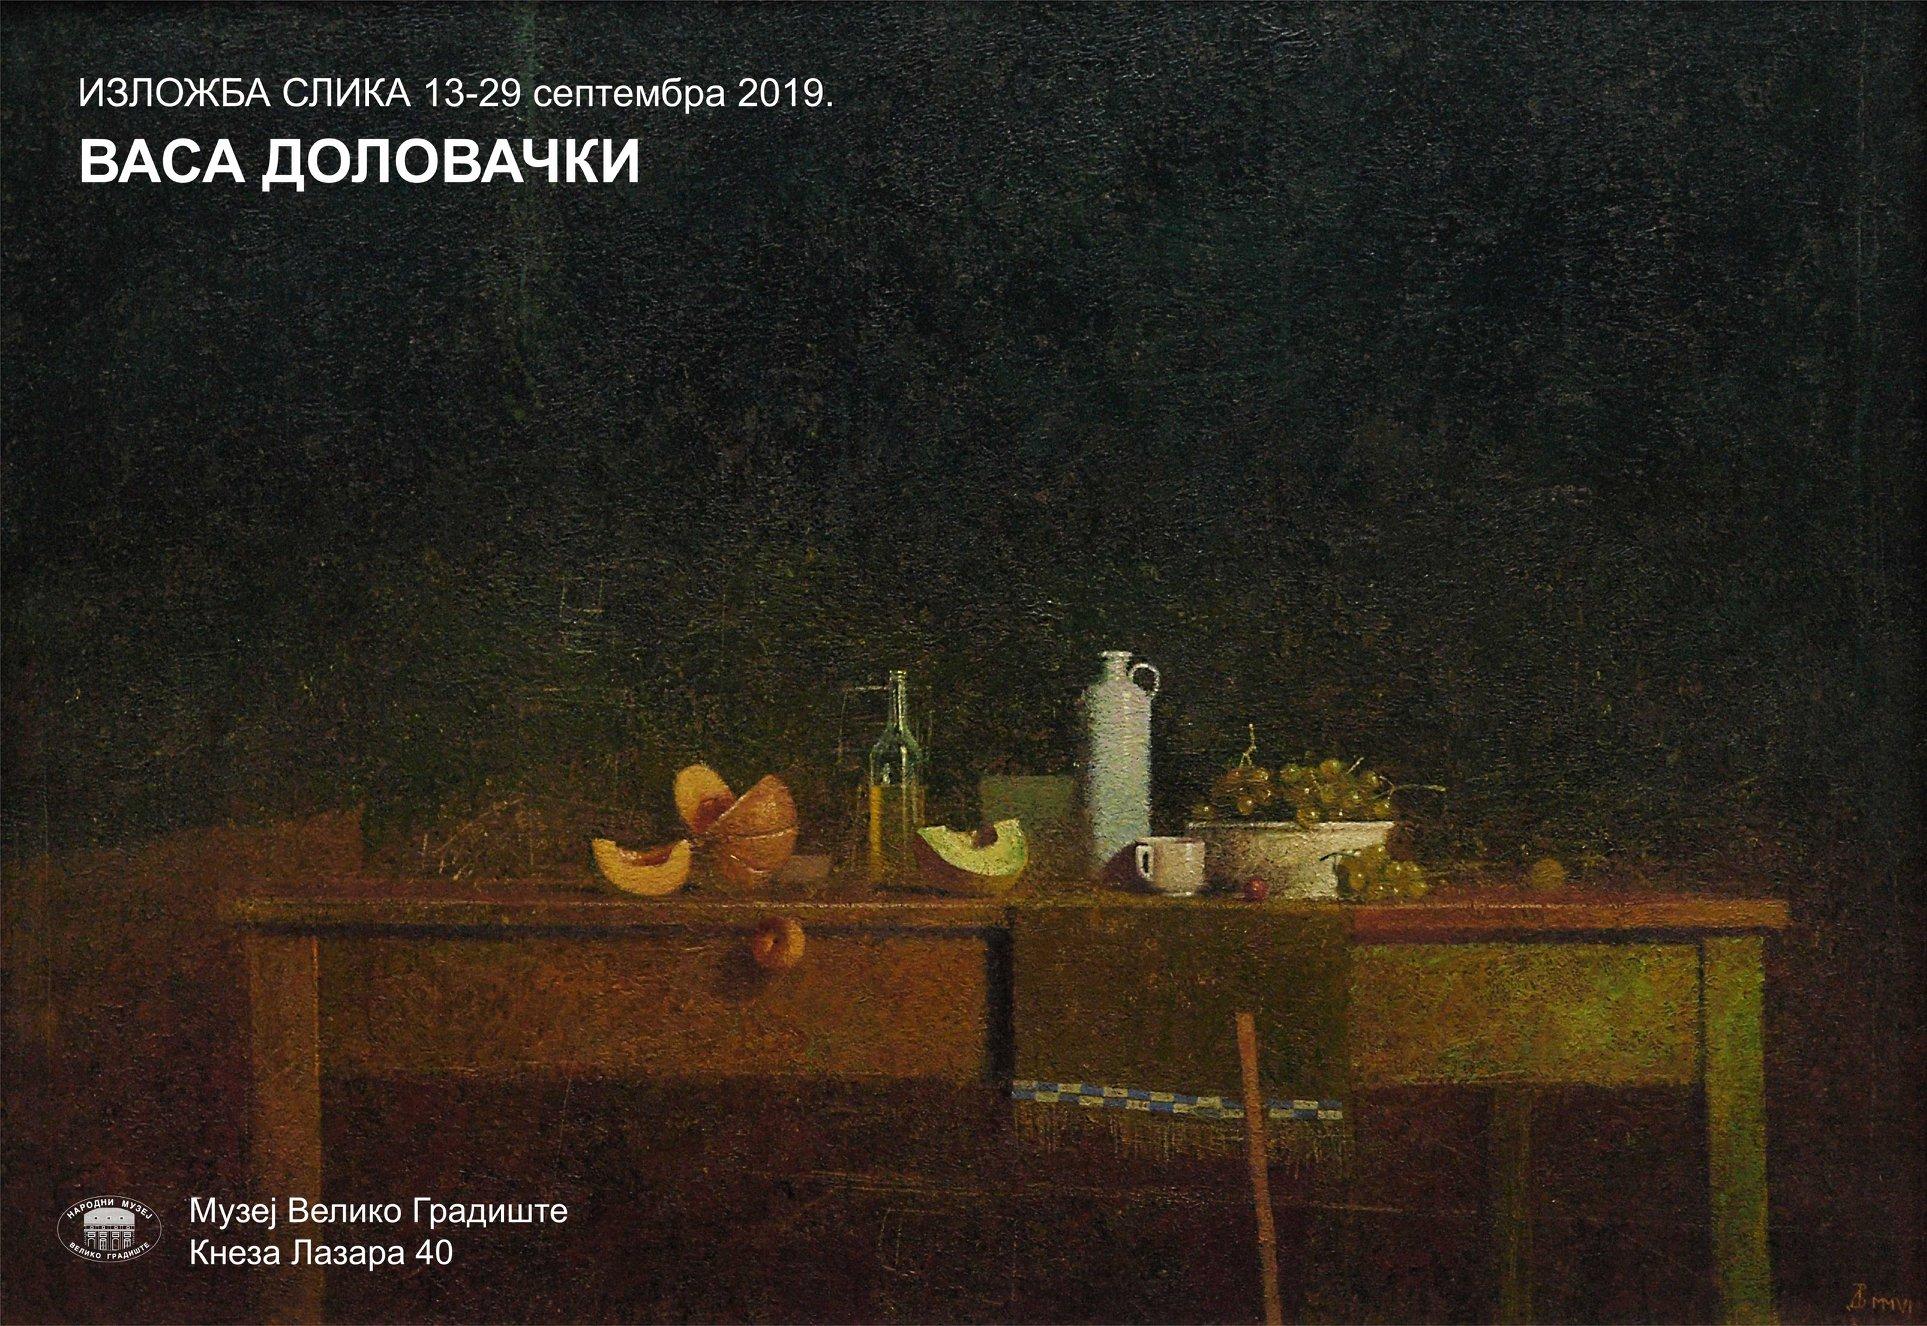 Izložba slika Vase Dolovačkog  u Narodnom muzeju Veliko Gradište 23164